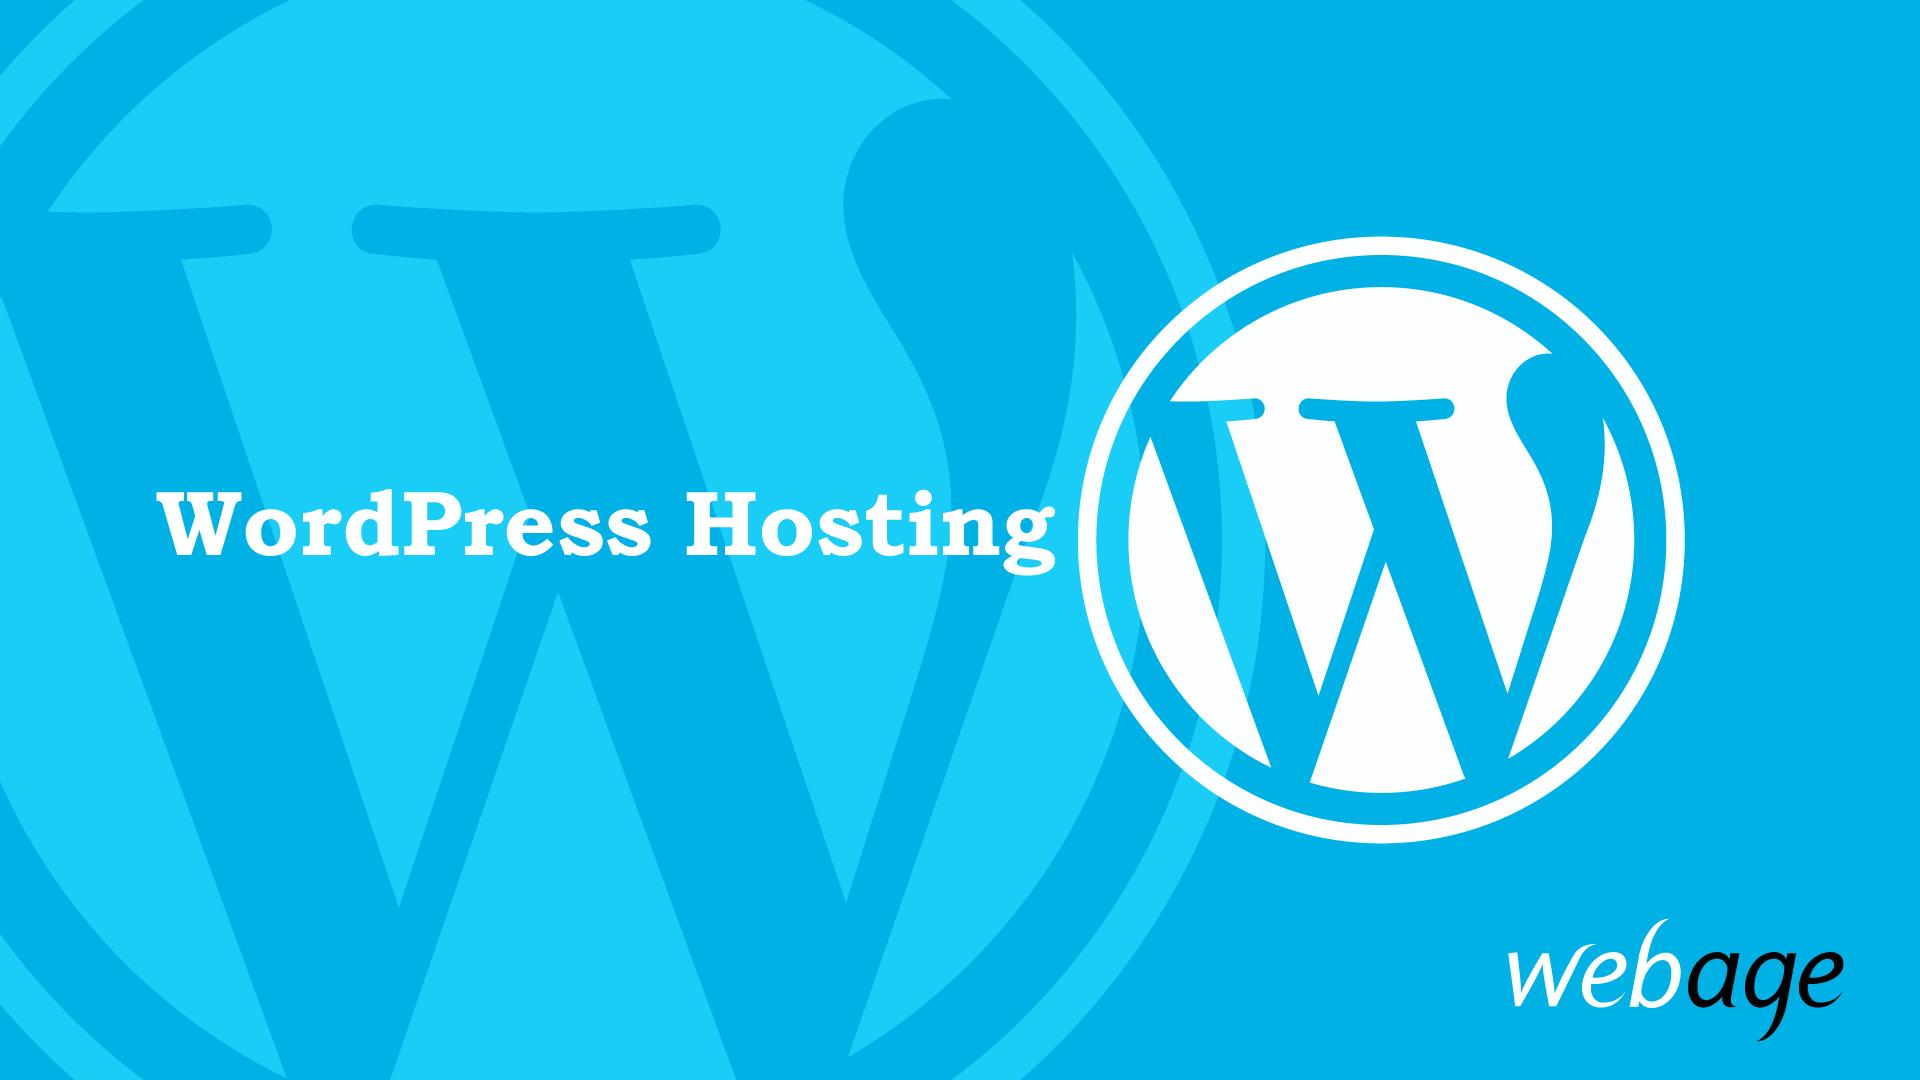 WordPress Hosting - Perfomance, Speed, Service & Great Value